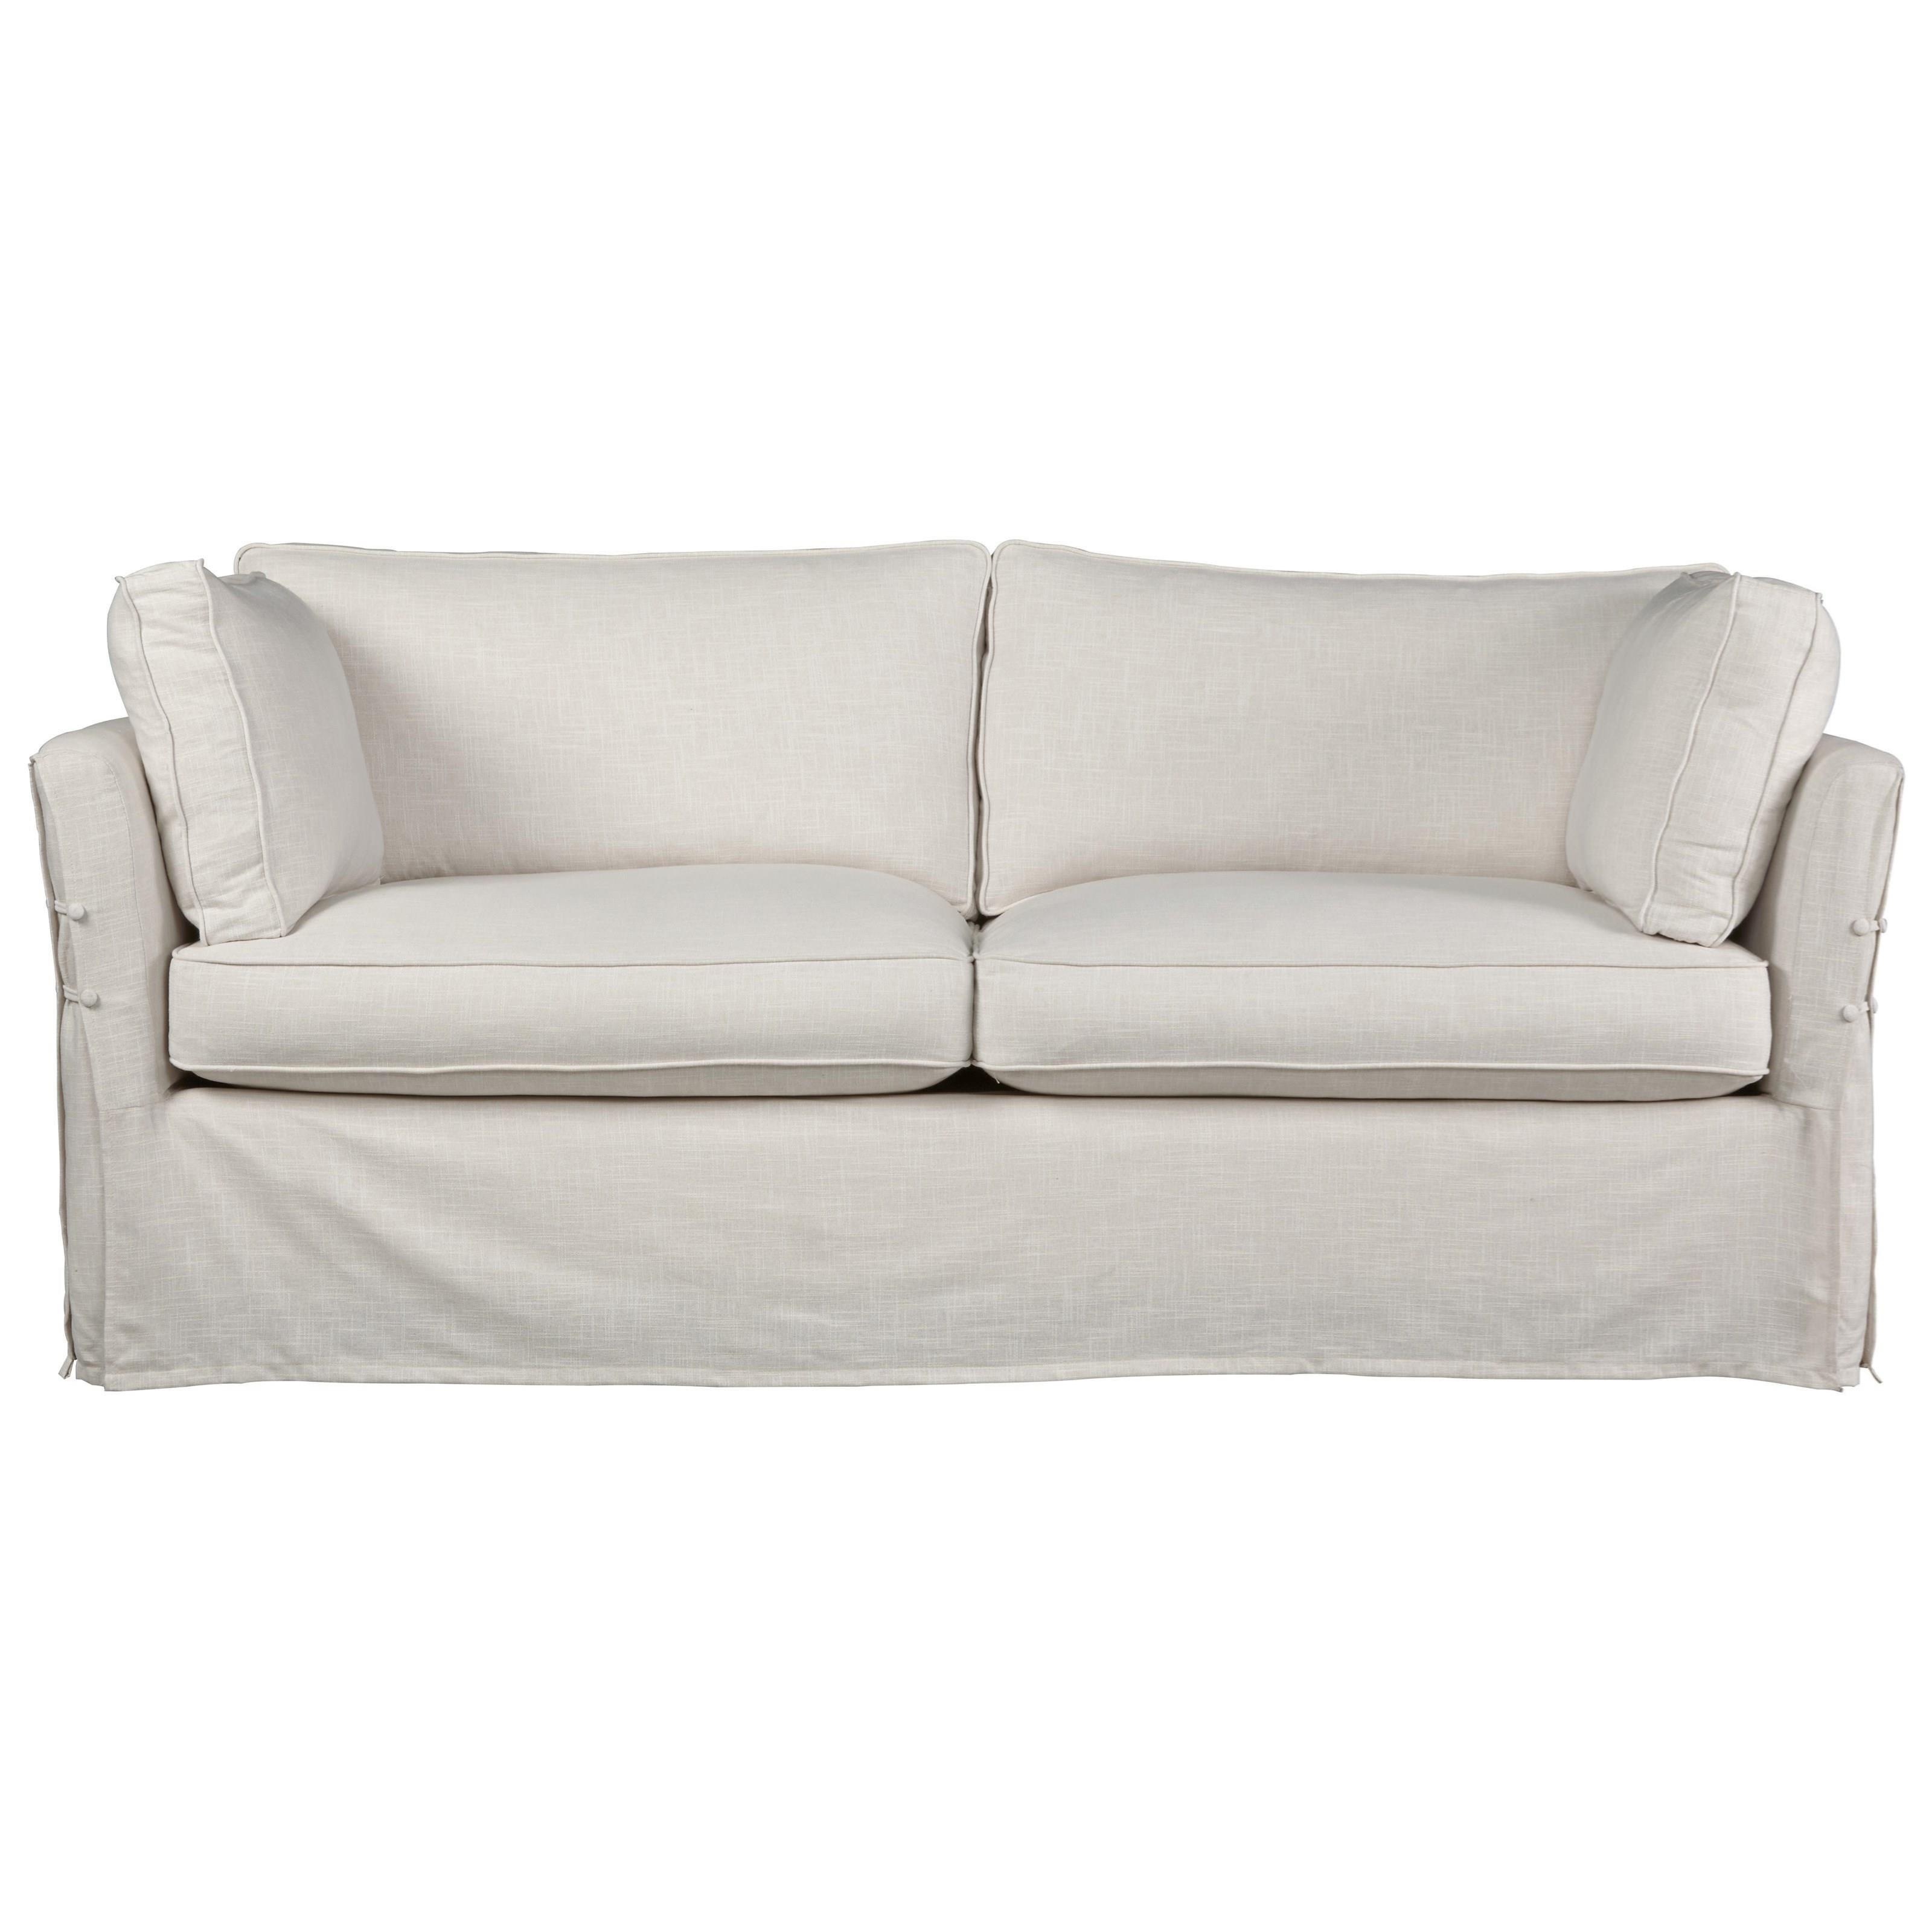 Farley Farley Sofa by Universal at Baer's Furniture